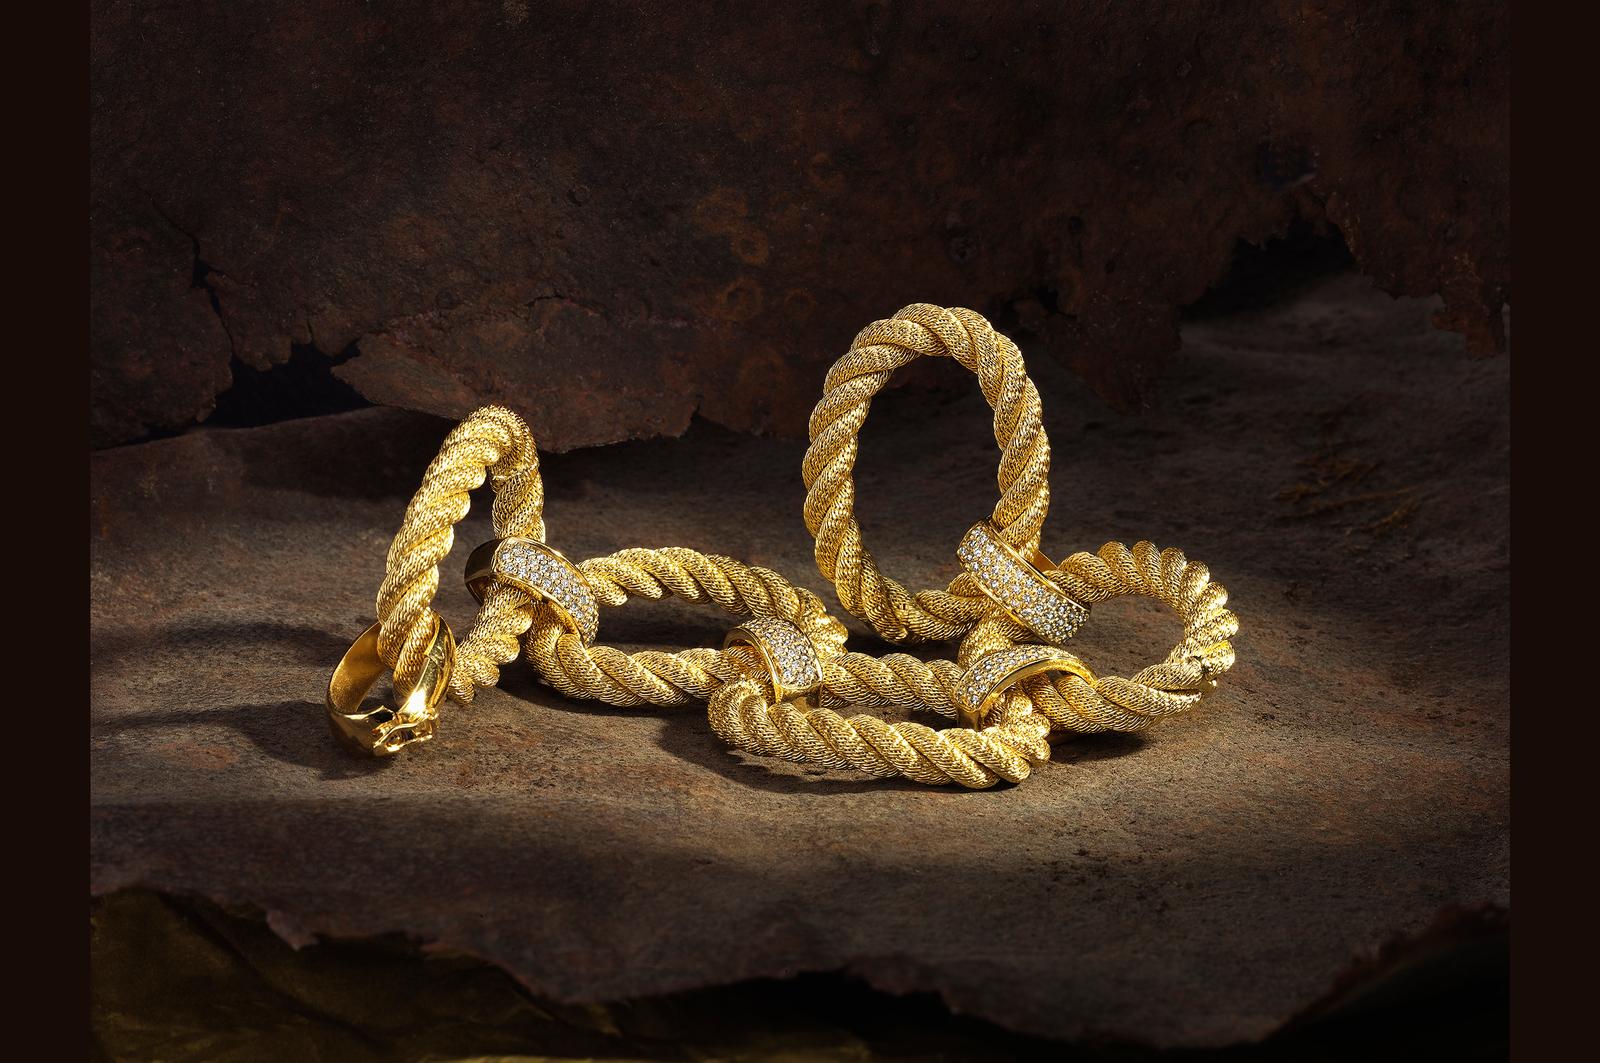 Gold Jewelry Photography 1.jpg